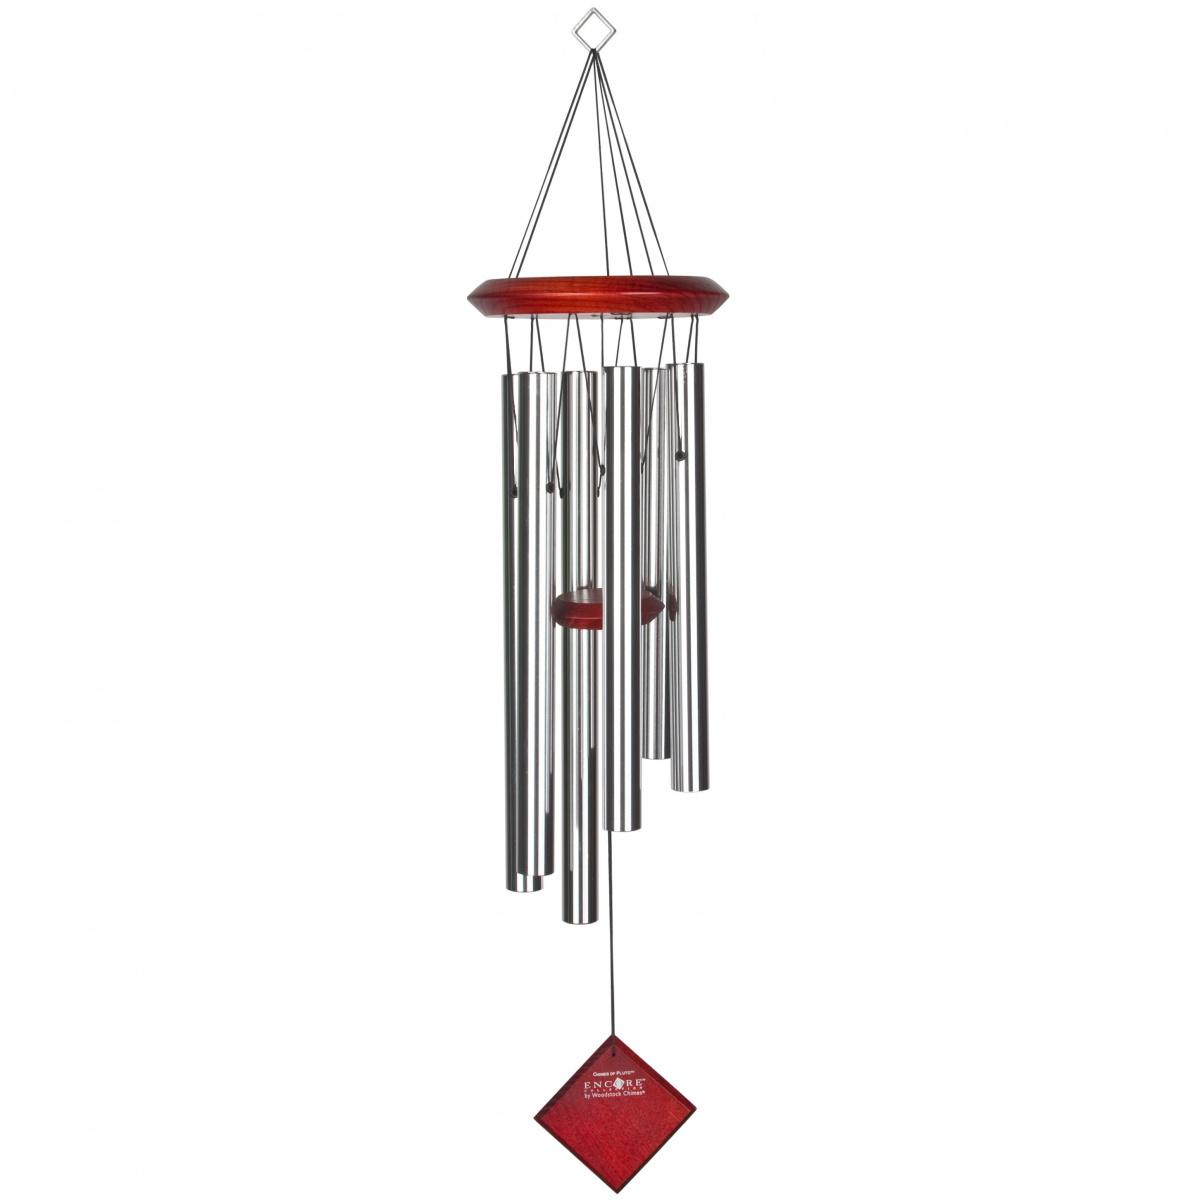 Woodstock vindspil, 68 cm - Pluto, sølv/mørk